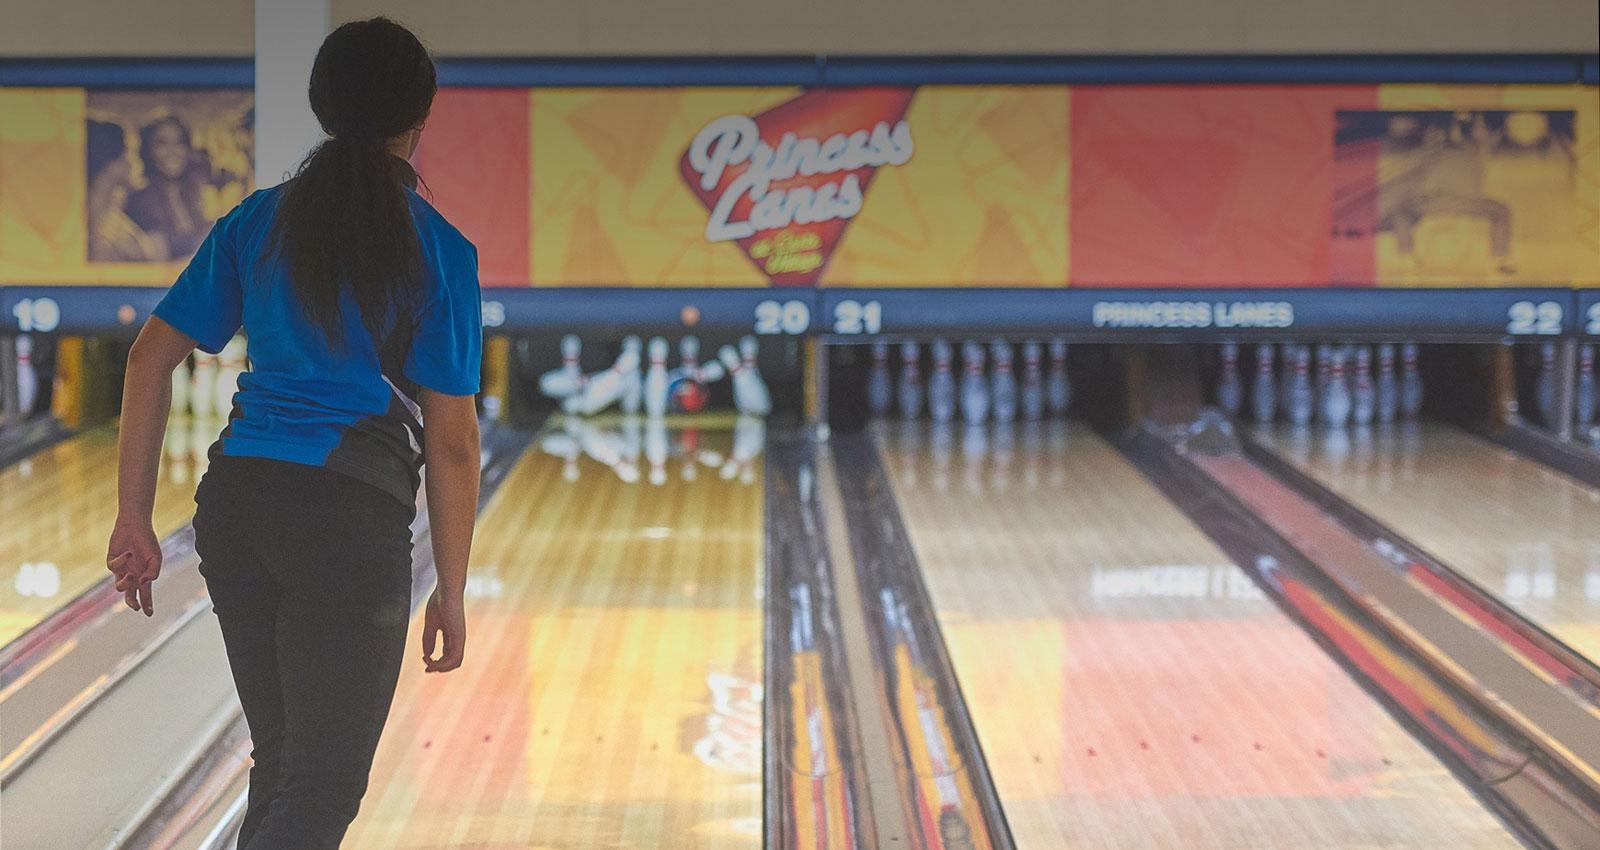 Princess Lanes Bowling Center in Caste Village